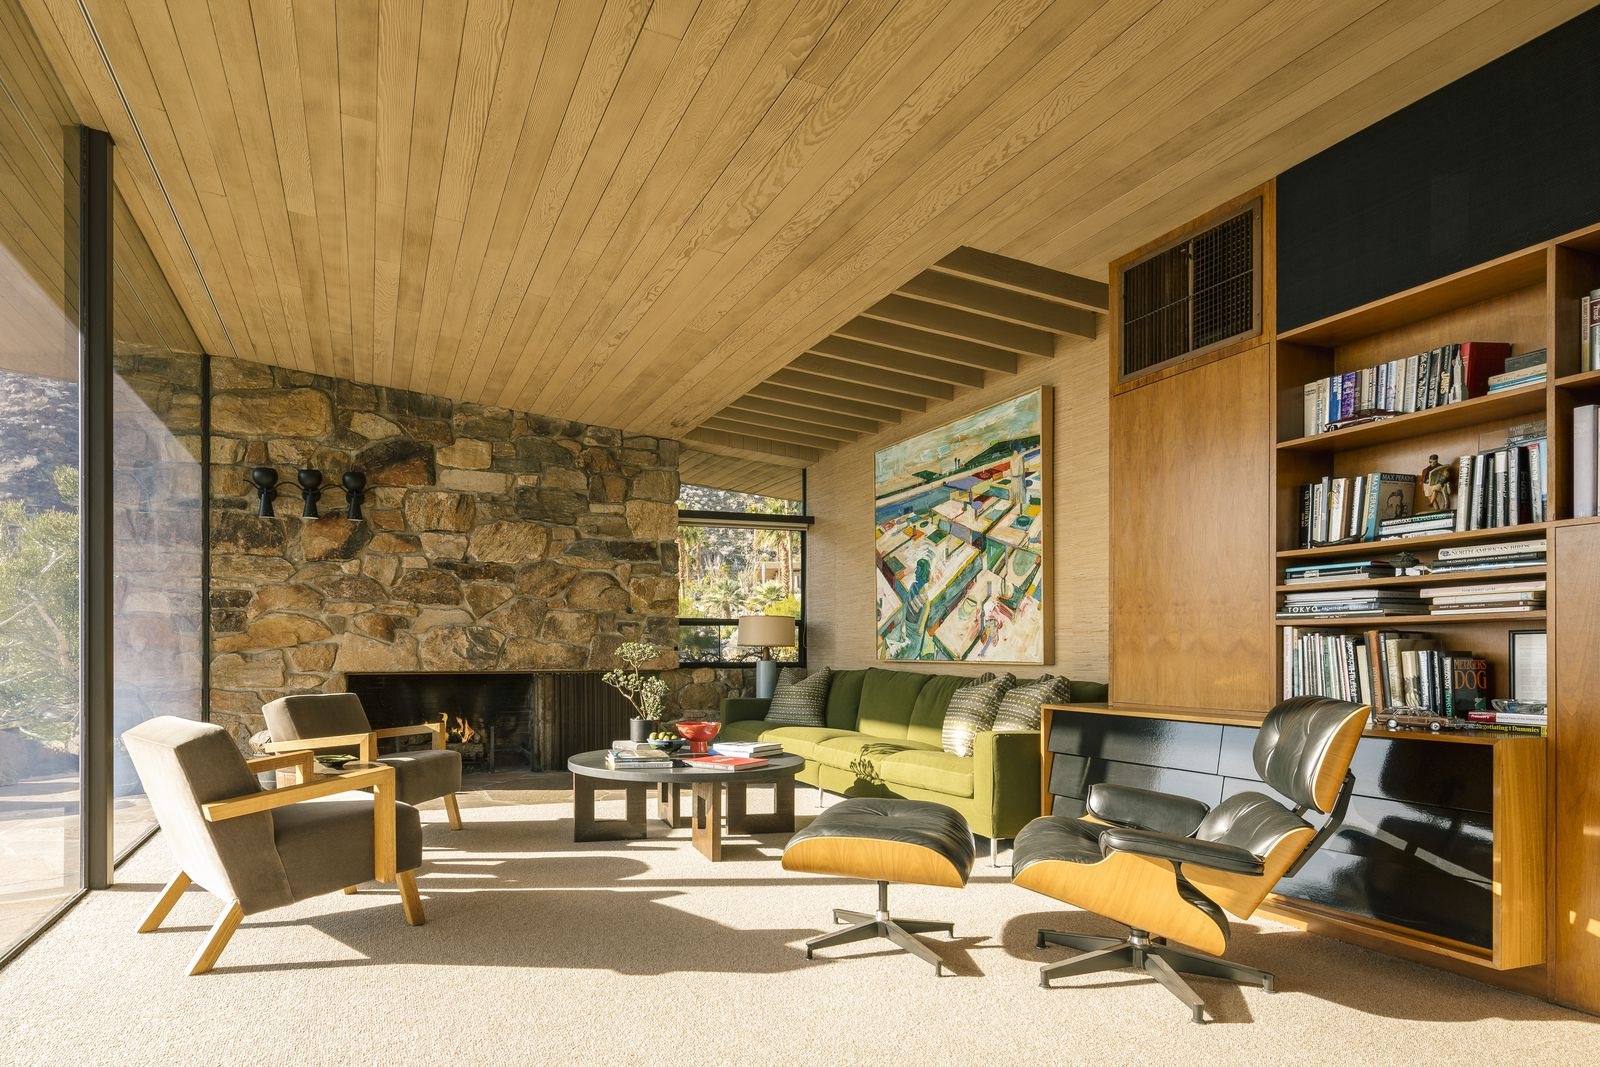 Palm Springs S Midcentury Edris House On The Market For 3